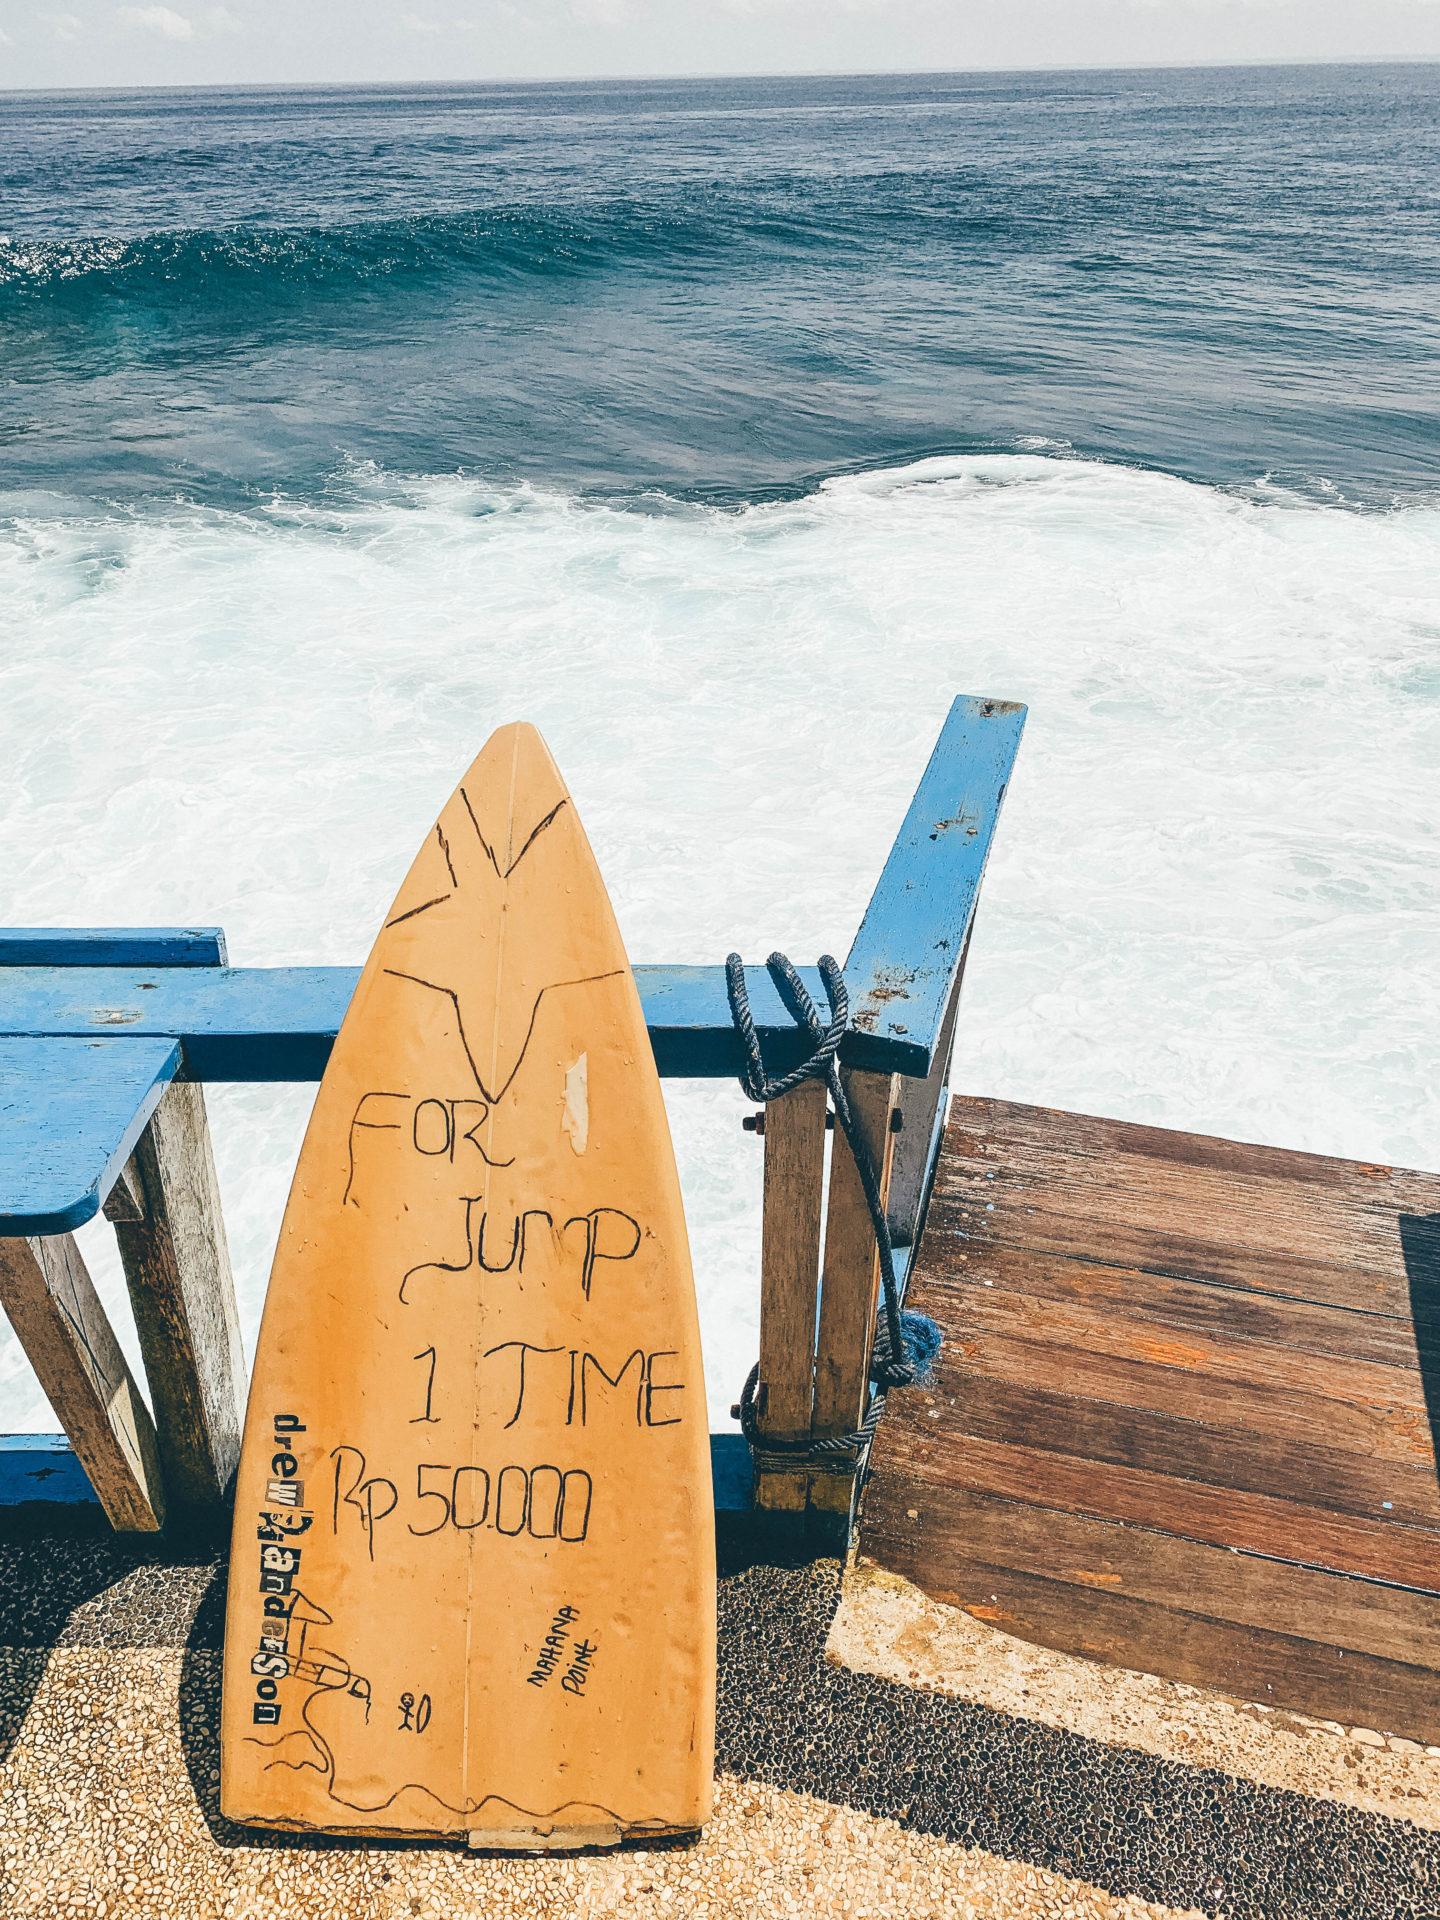 jumping ocean bali nusa ceningan nusa lembongan nusa penida isladn indonesia trip travelling brunettie